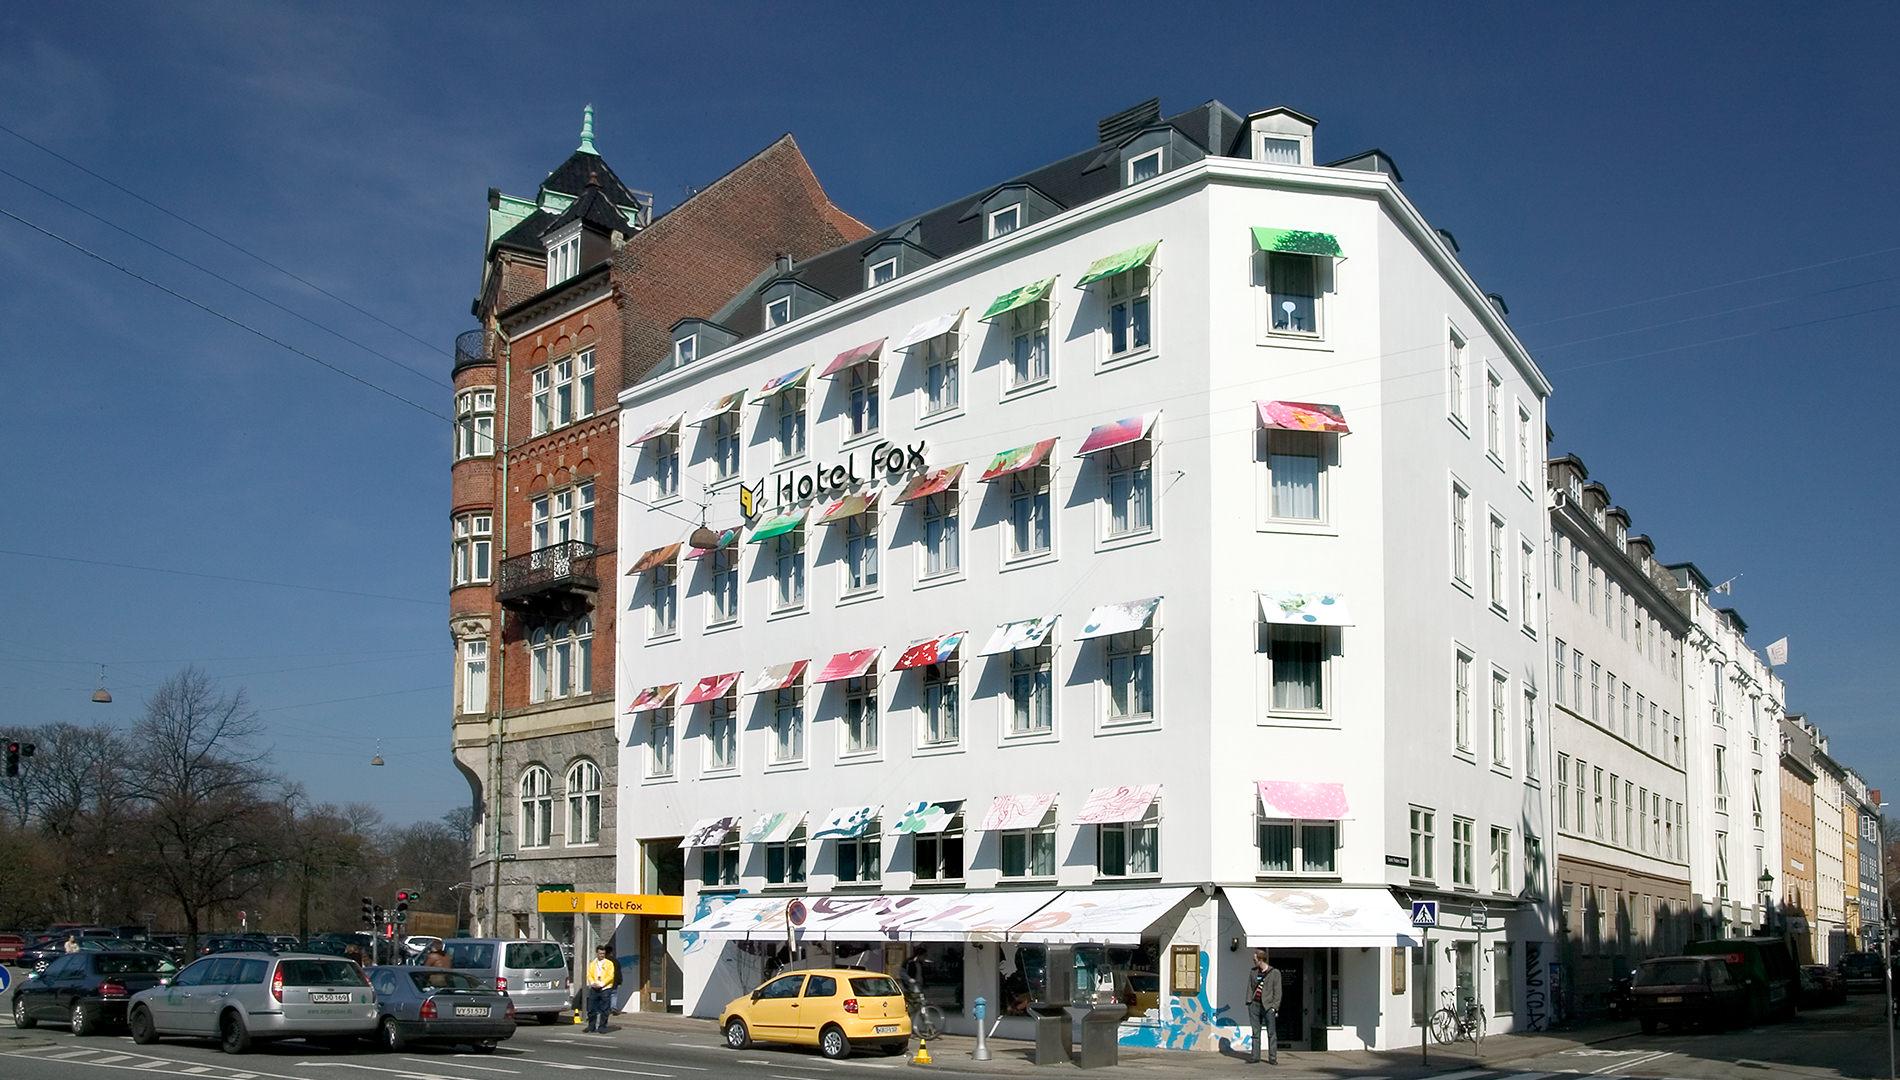 Messe Design Live Kommunikation Kopenhagen VW Projekt Fox Hotel Fassade Eingang Going Places EventLabs